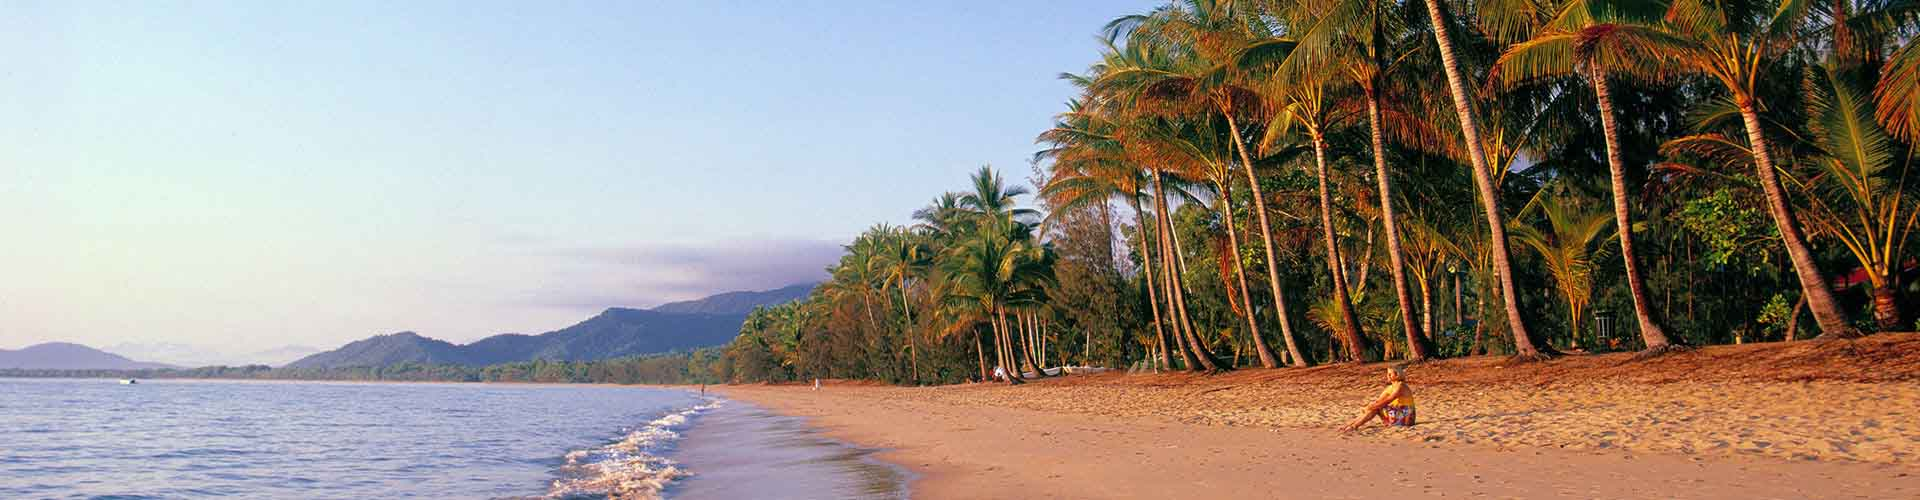 Cairns - Albergues Juveniles en Cairns. Mapas de Cairns, Fotos y Comentarios para cada Albergue Juvenil en Cairns.